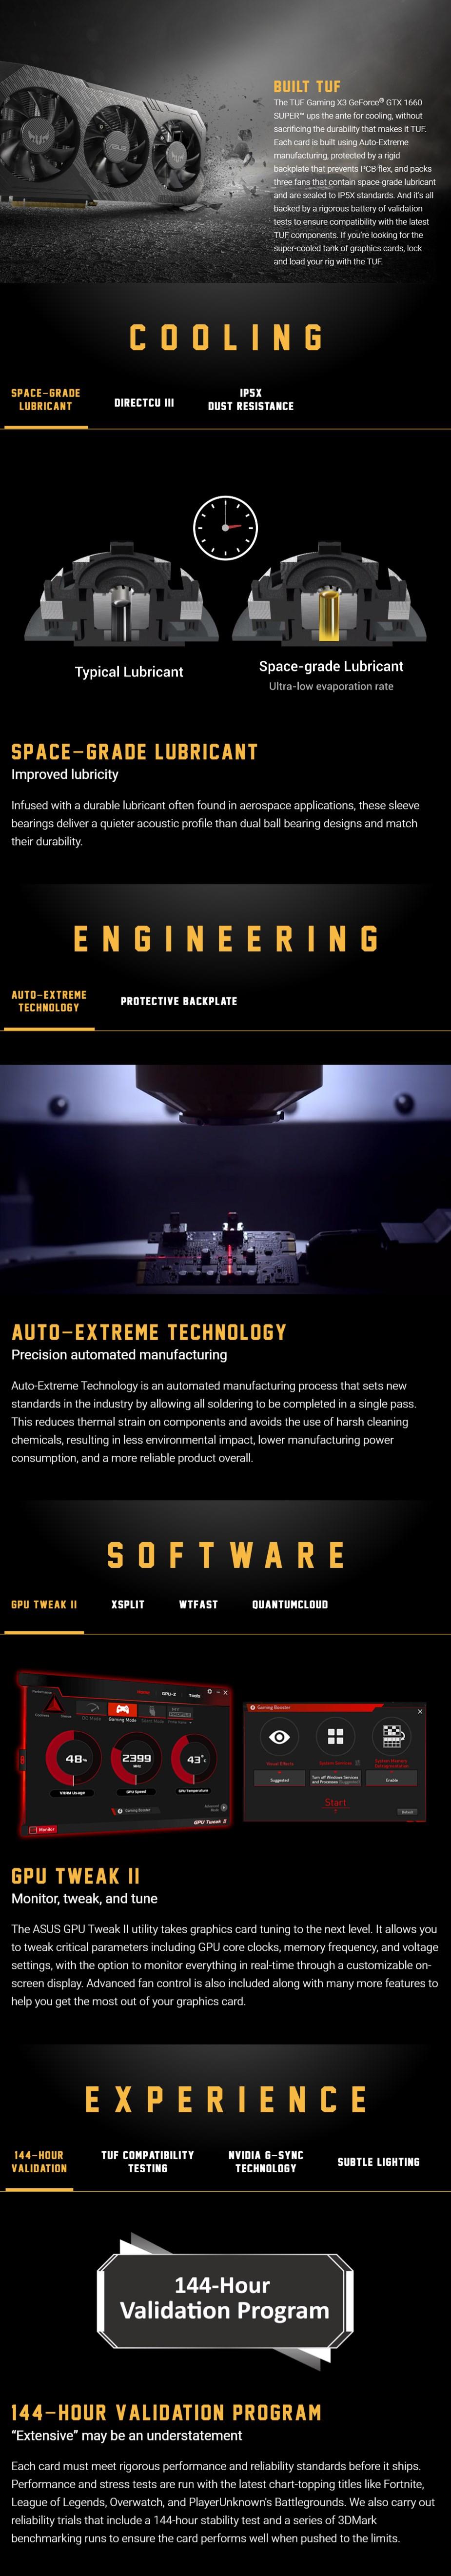 asus-geforce-gtx-1660-super-tuf-gaming-x3-oc-6gb-video-card-ac28549-13.jpg